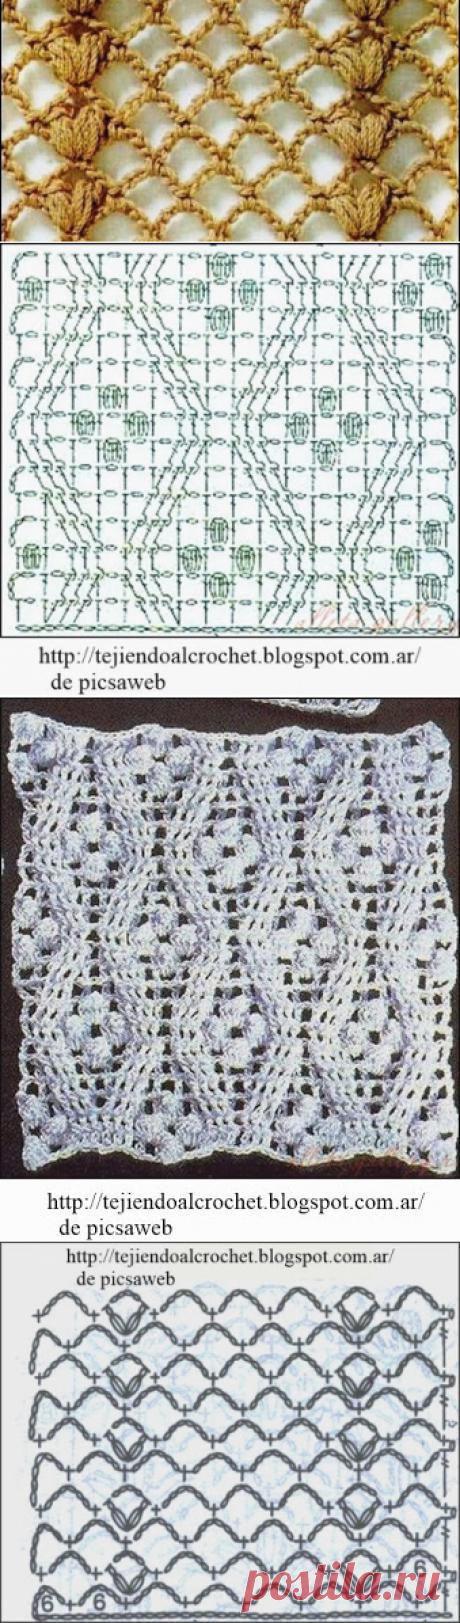 Posts search: вязание крючком